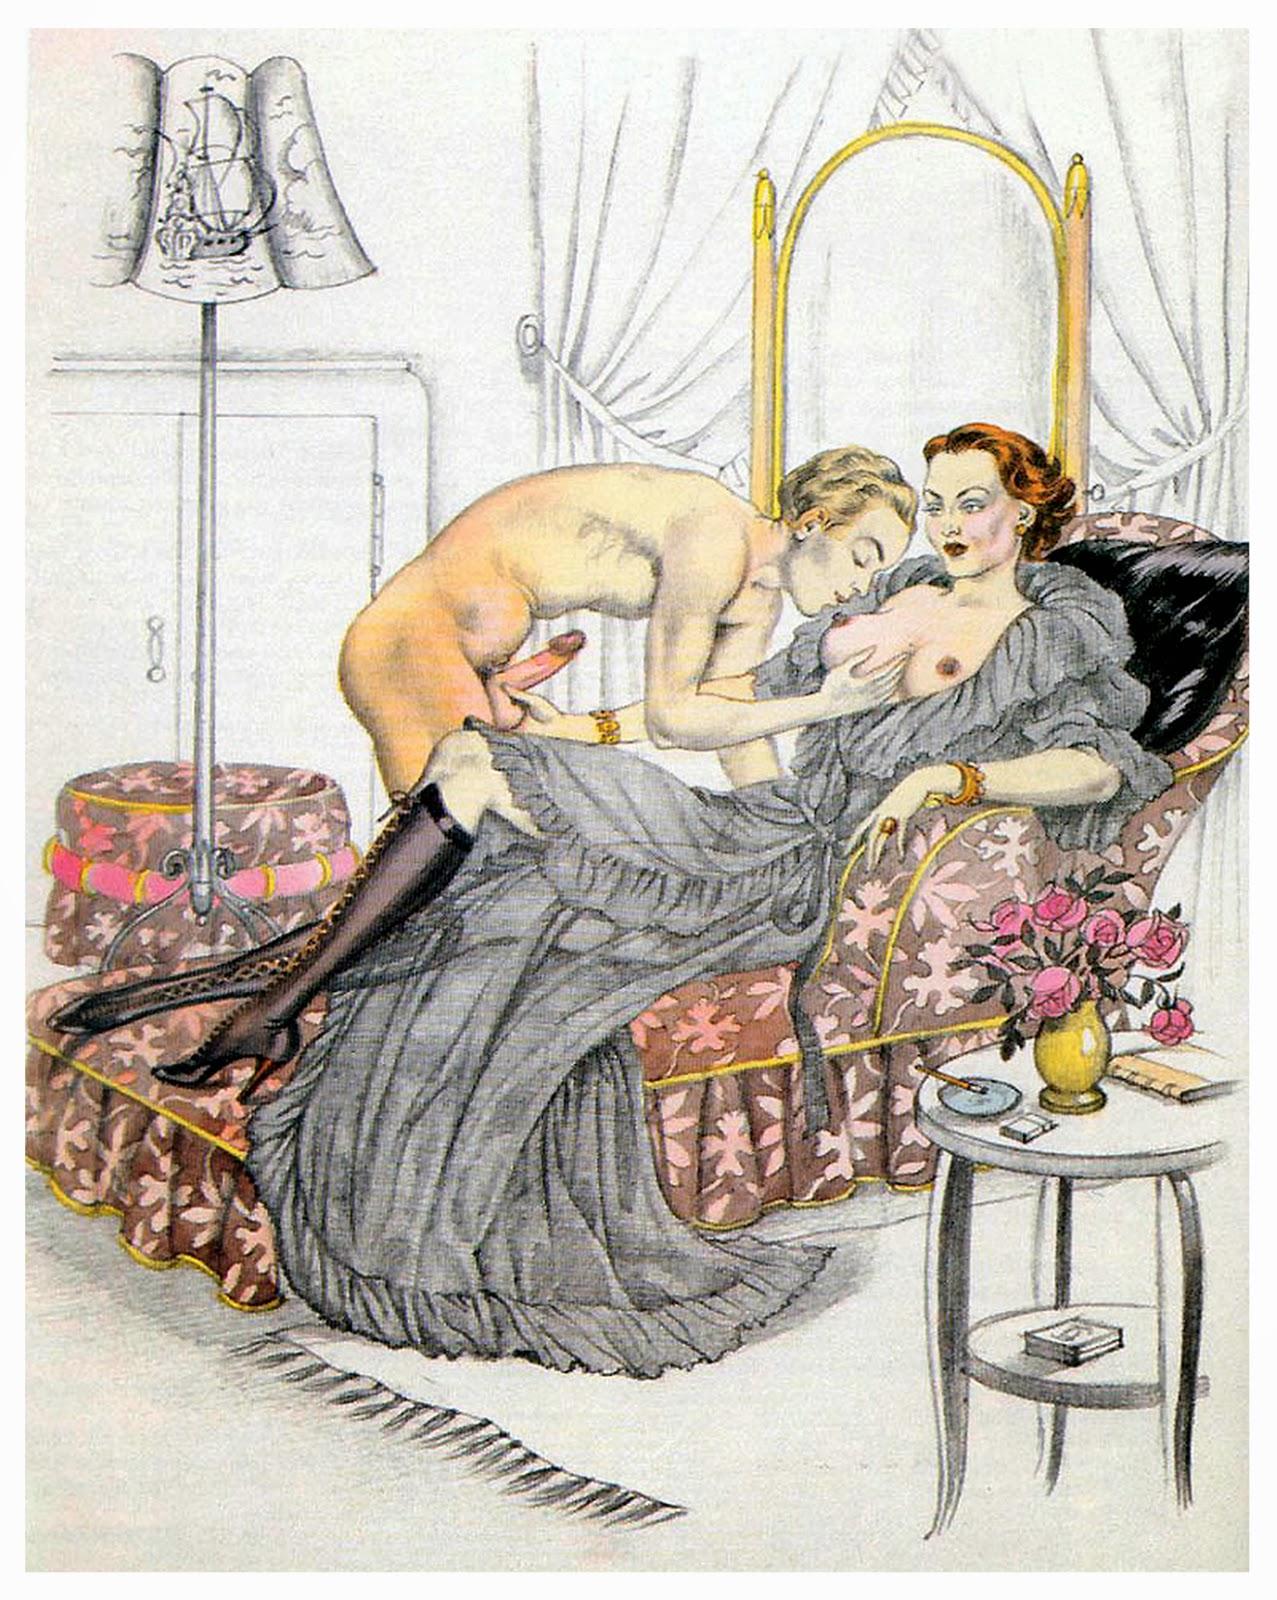 Sex fantasy art 1920s 1930s nudes picture